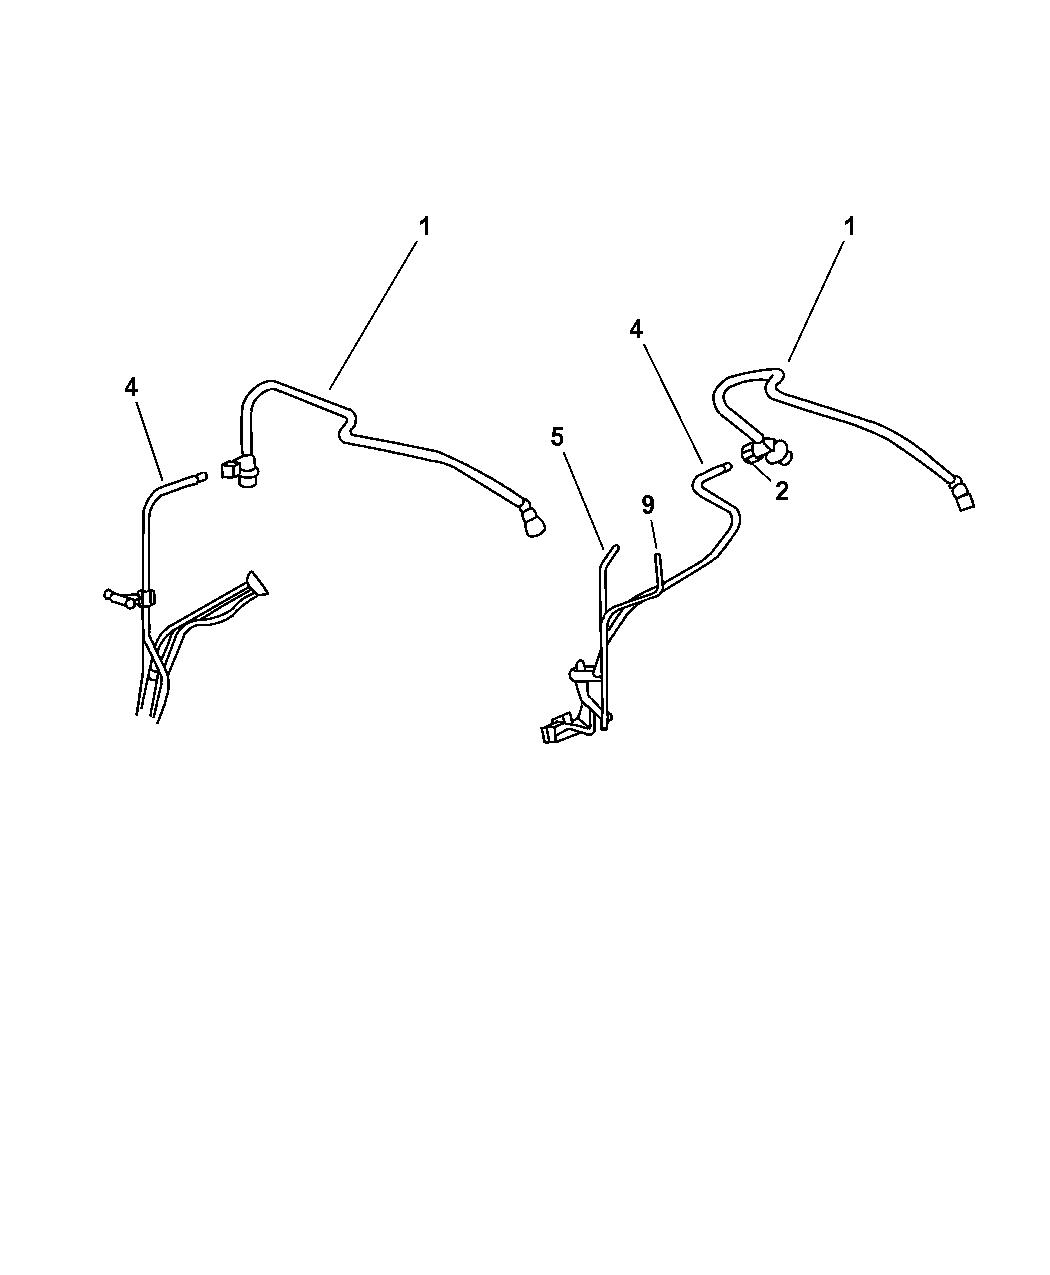 The Underside Of Engine Diagram 2002 Pt Cruiser Wiring Library 2006 Chrysler 2005 Fuel Line